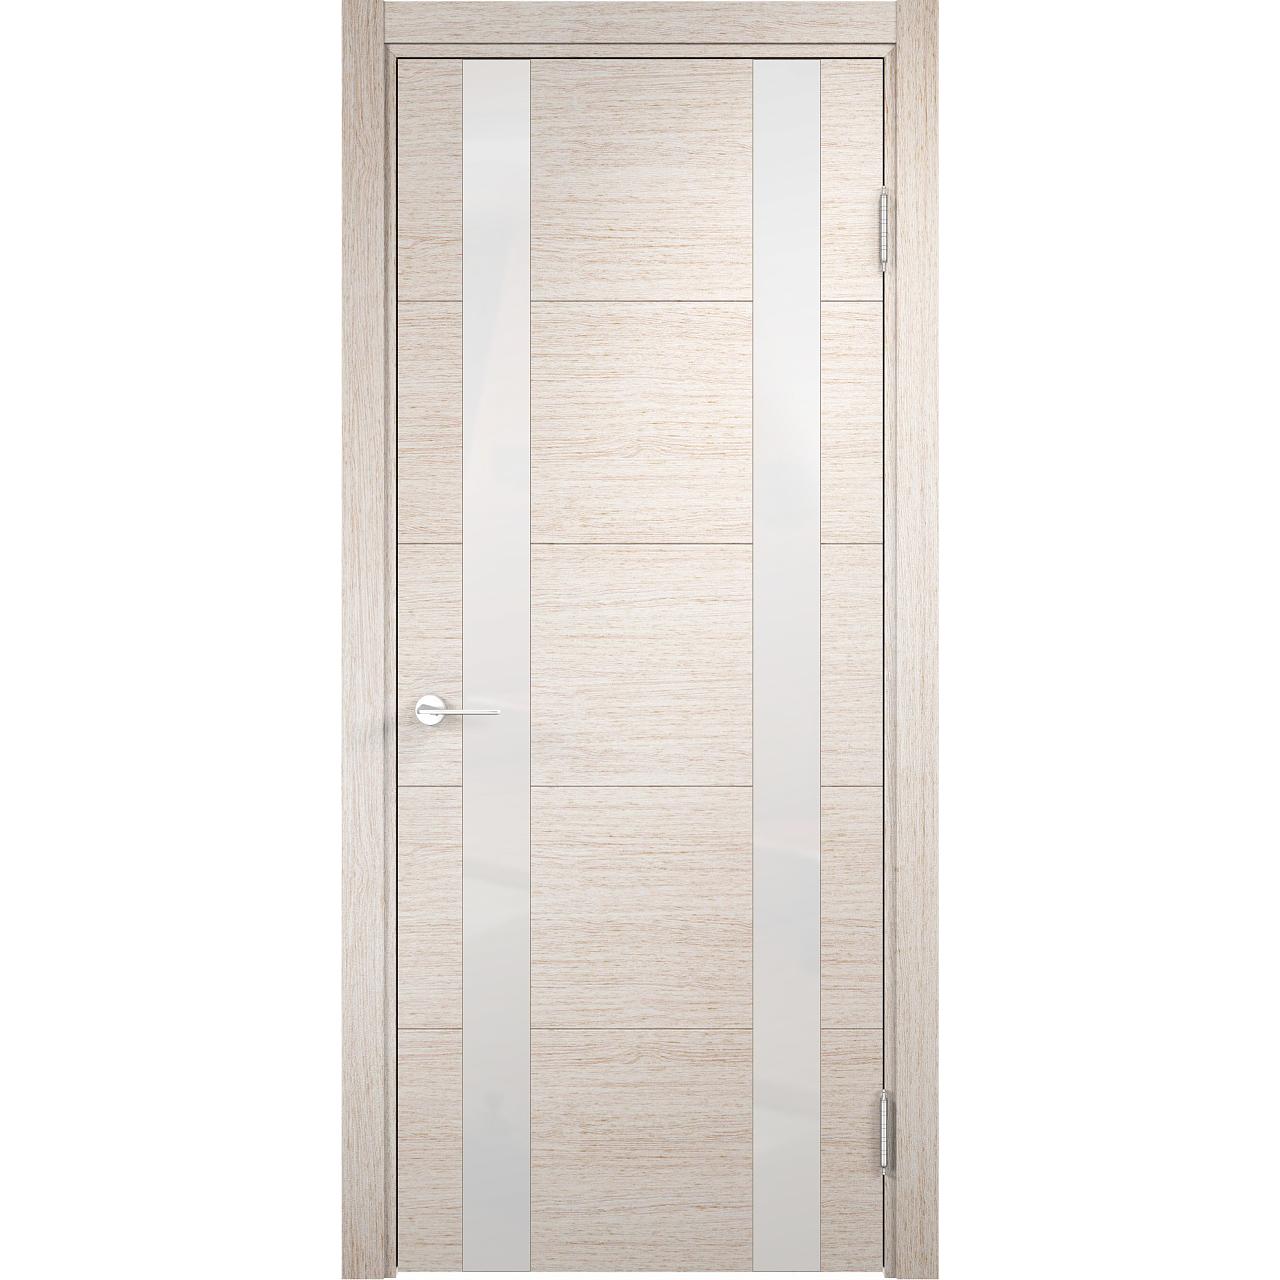 Межкомнатная дверь экошпон Турин 06